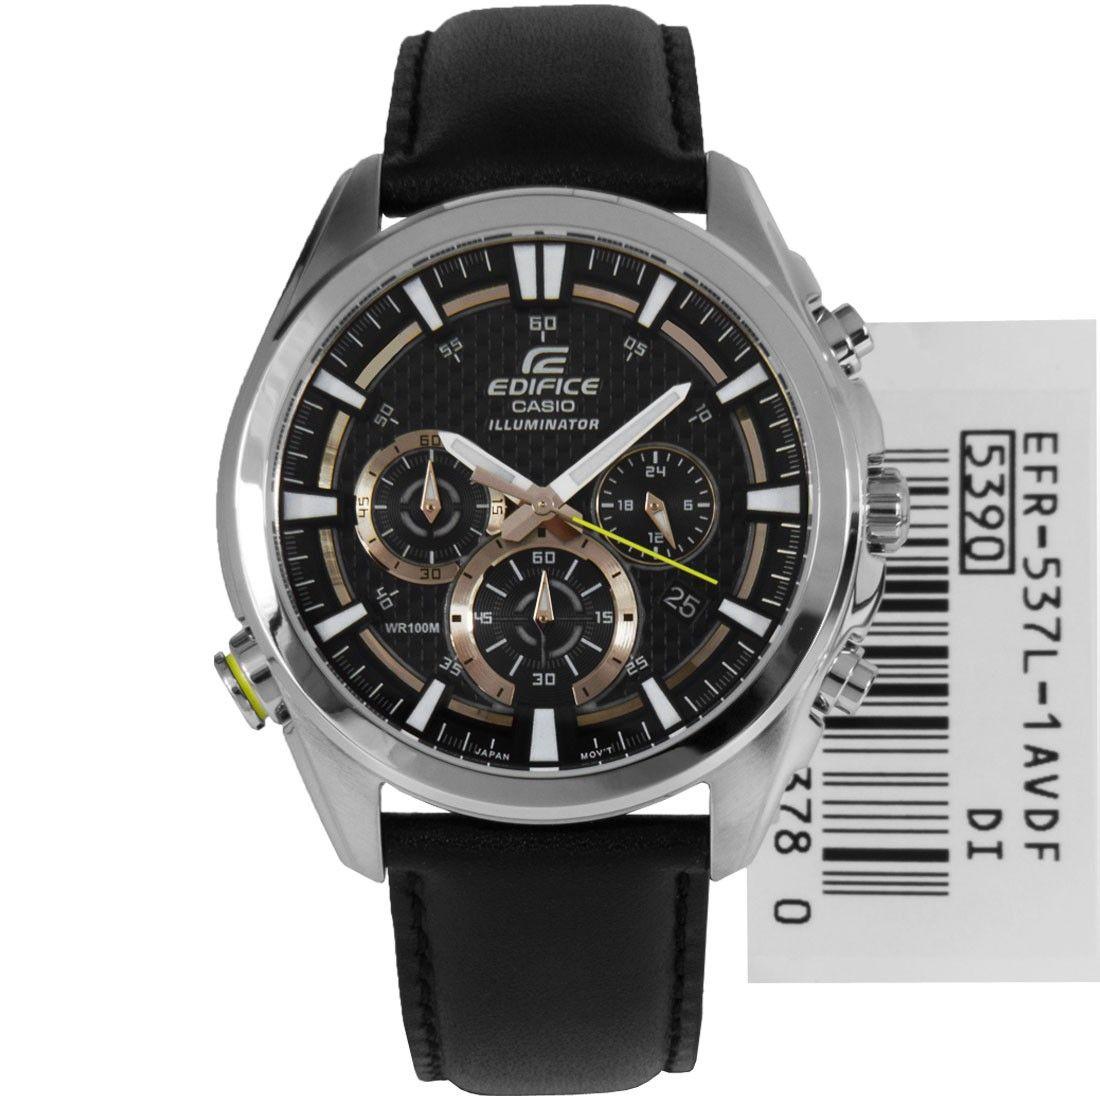 Casio Edifice Chronograph Mens Sports Watch EFR537L1AV